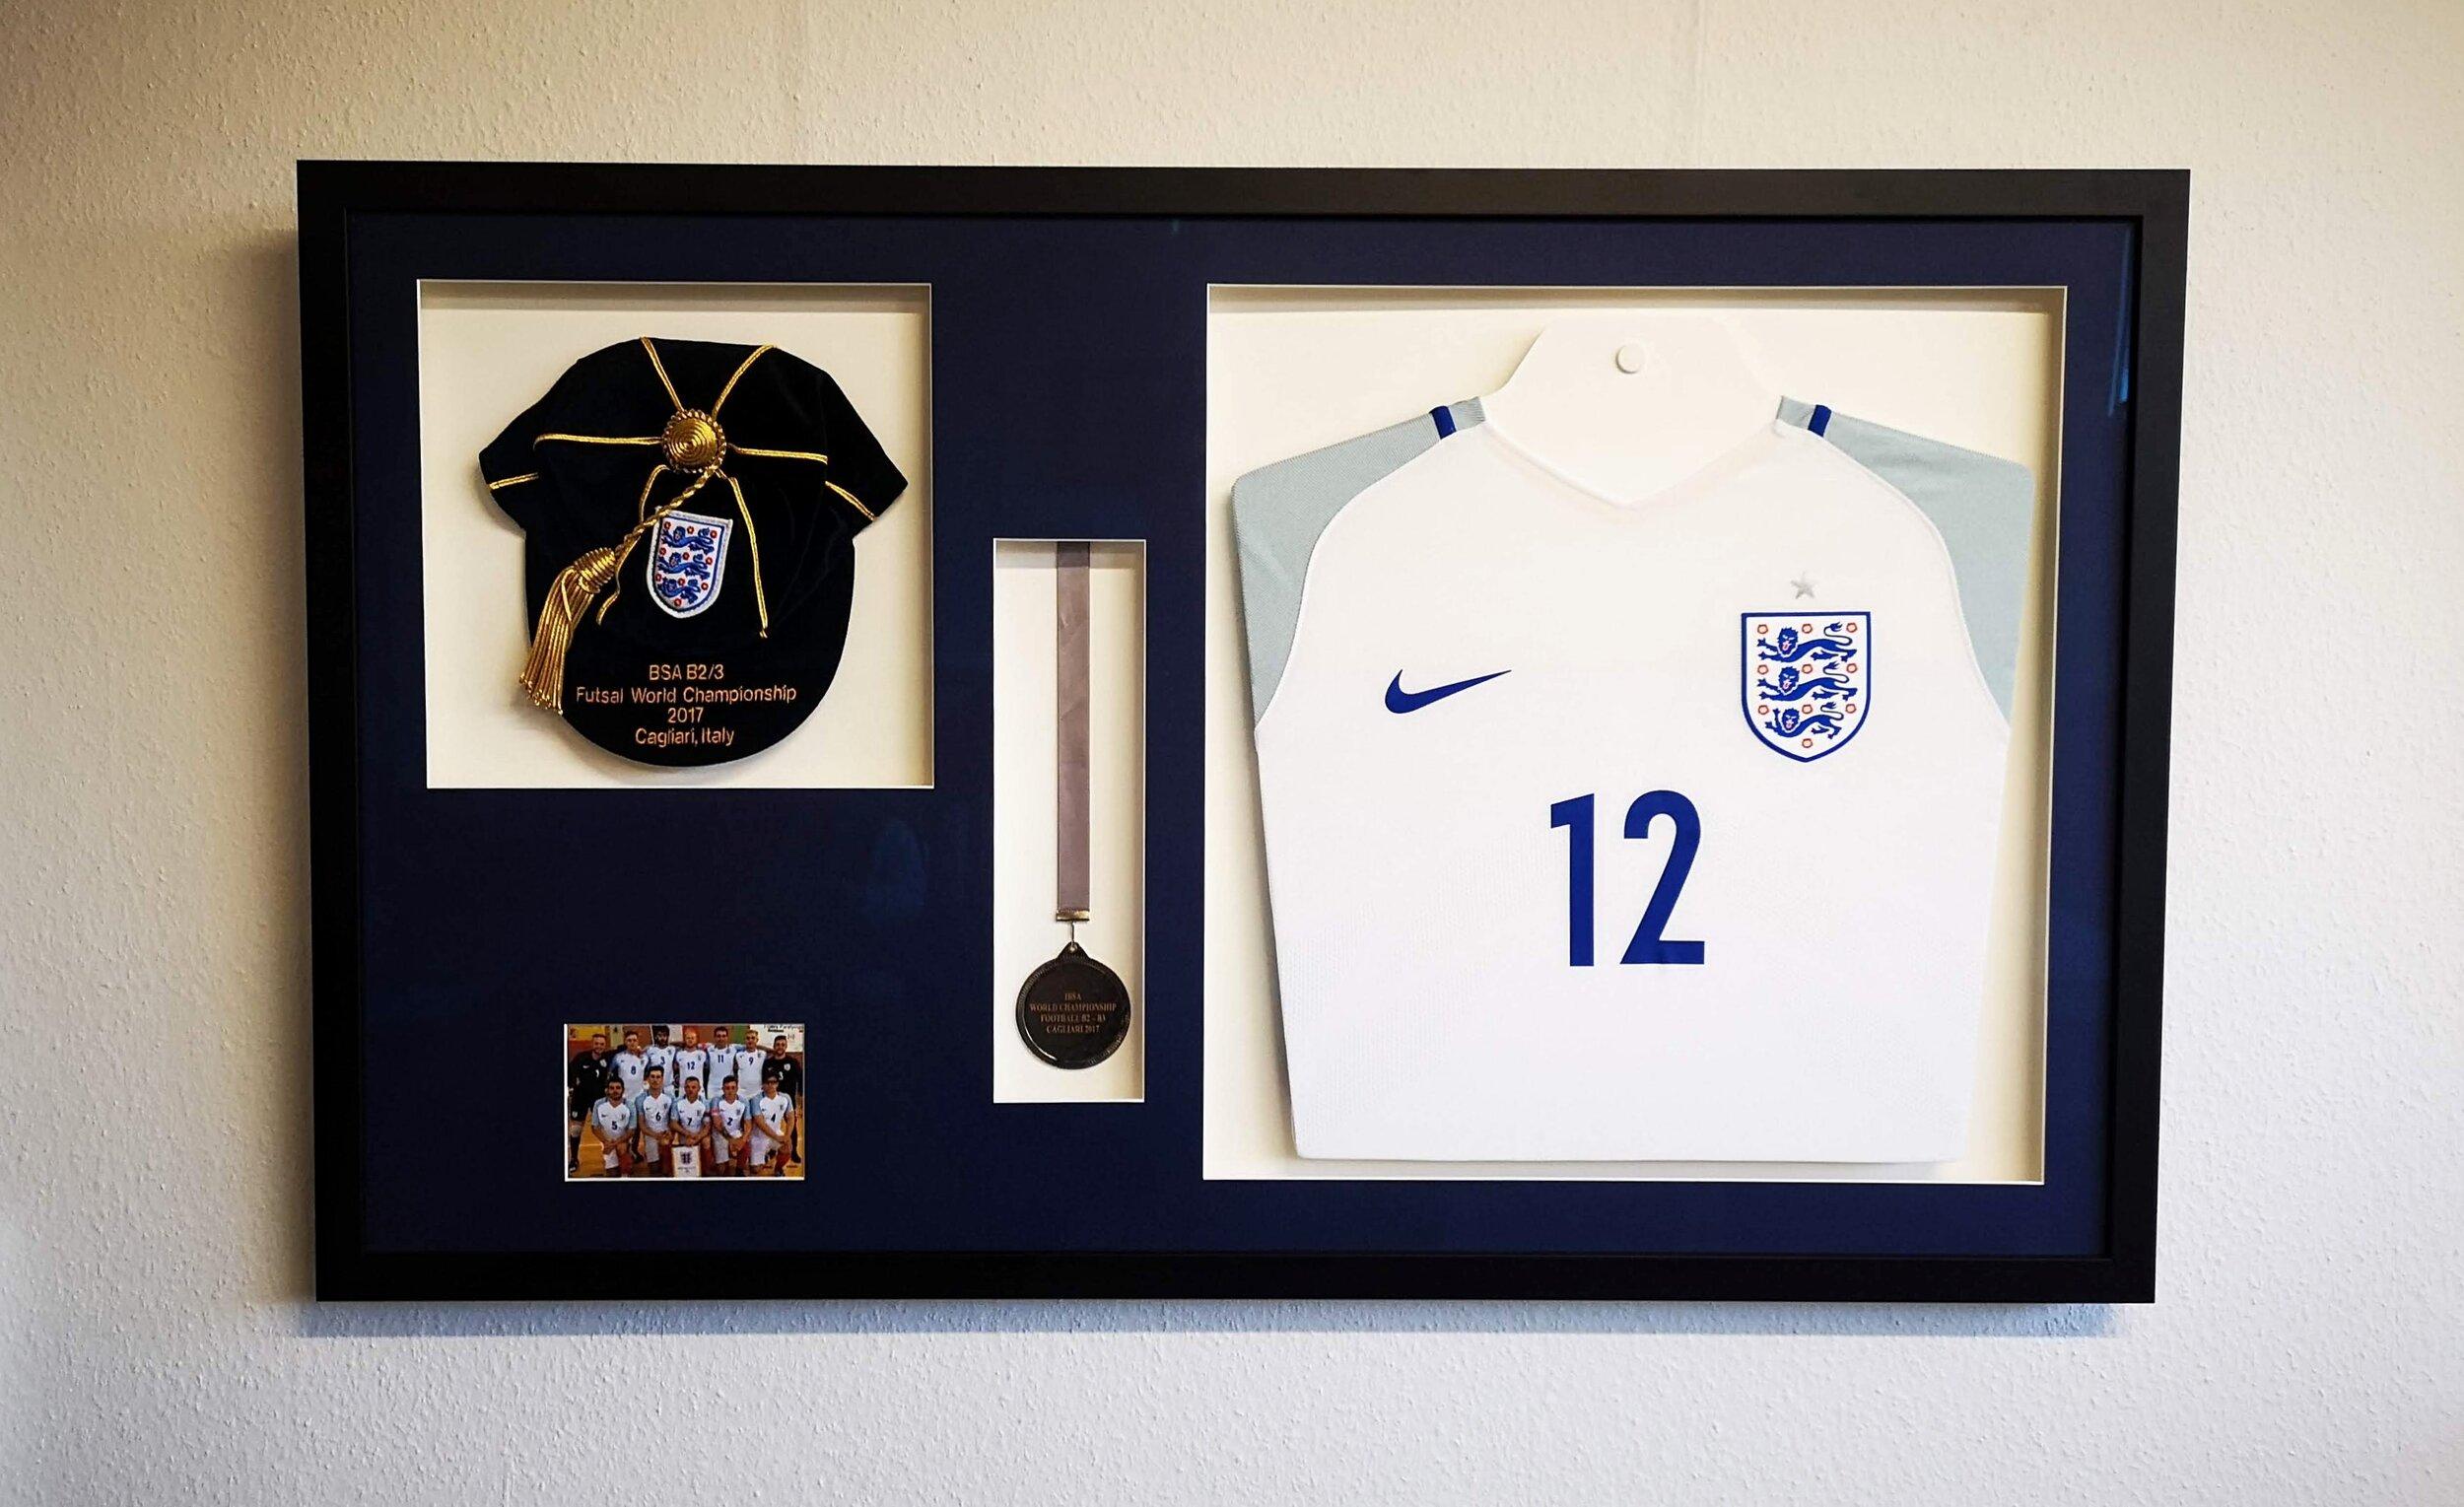 crayford-picture-framing-framed-england-shirt-memorabilia.jpg